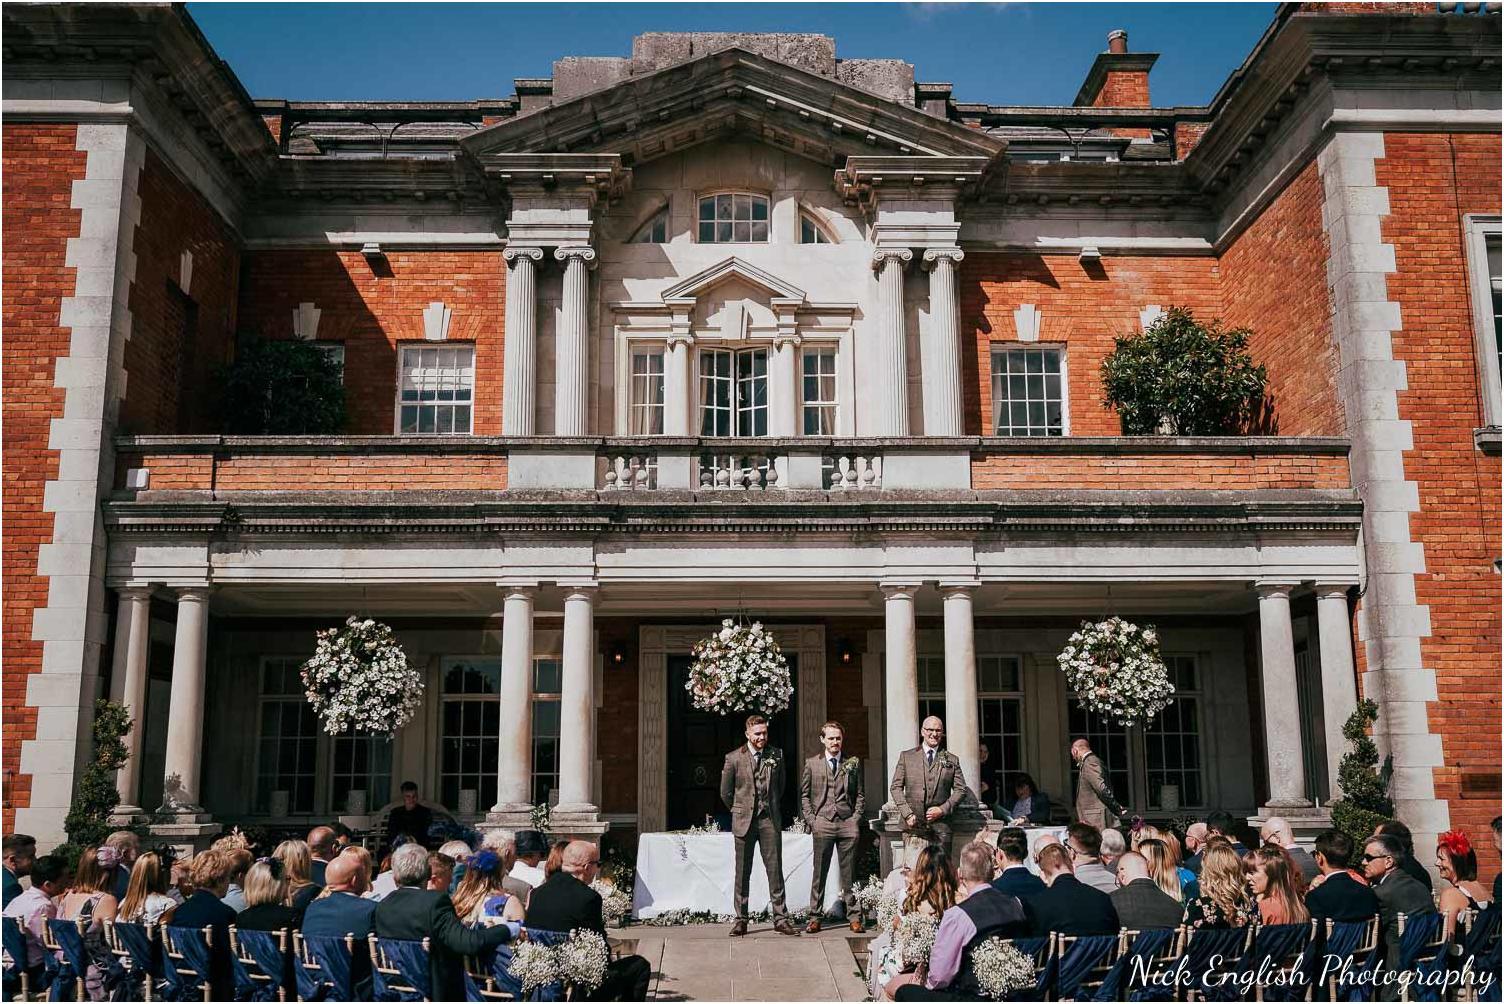 Eaves_Hall_Outdoor_Wedding_Photograph-27.jpg